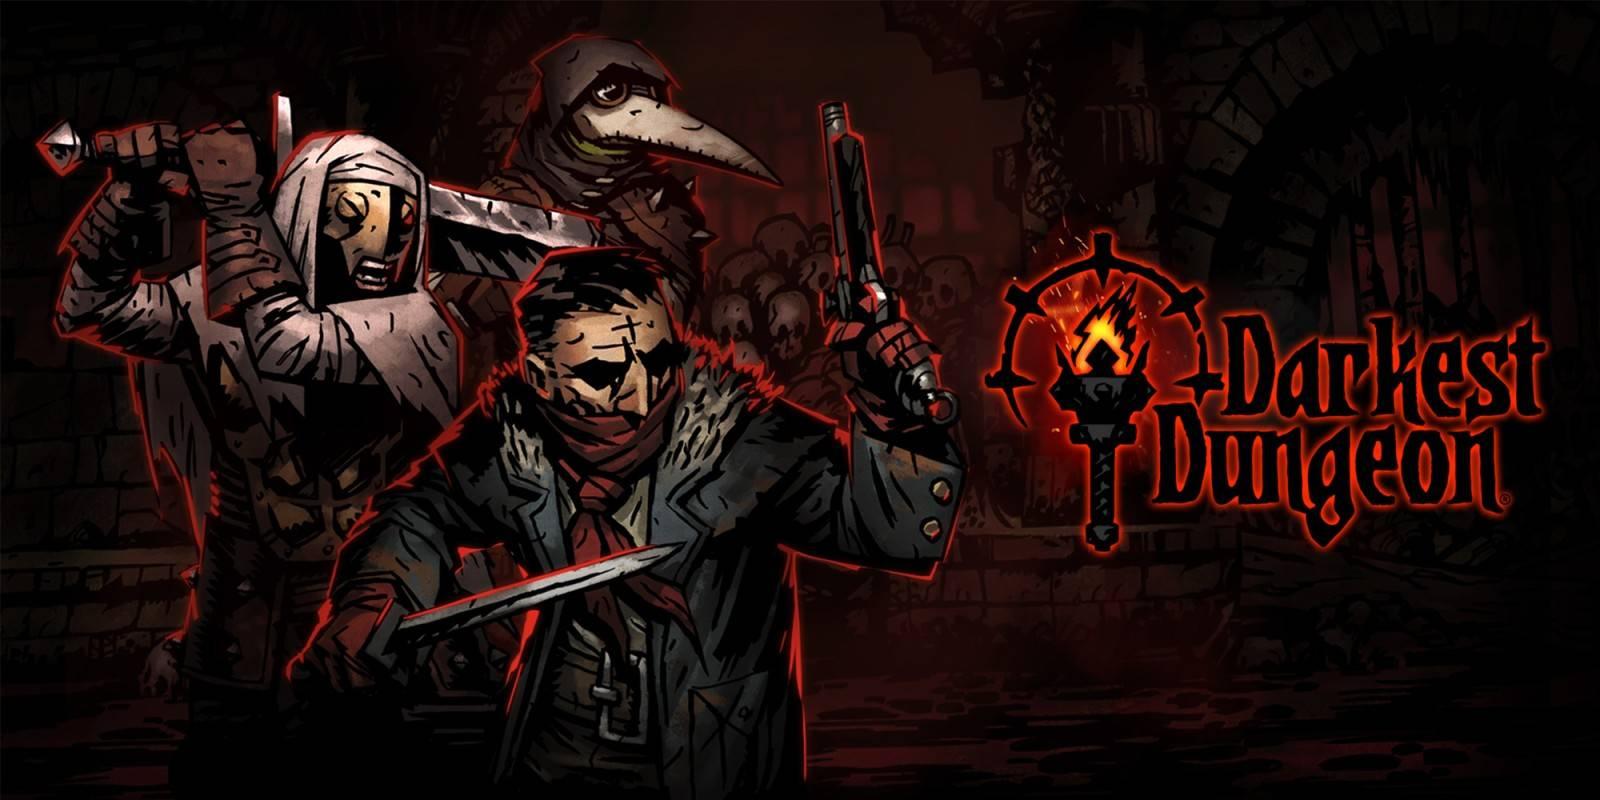 Лучший косплей: Darkest Dungeon и Dark Souls 8